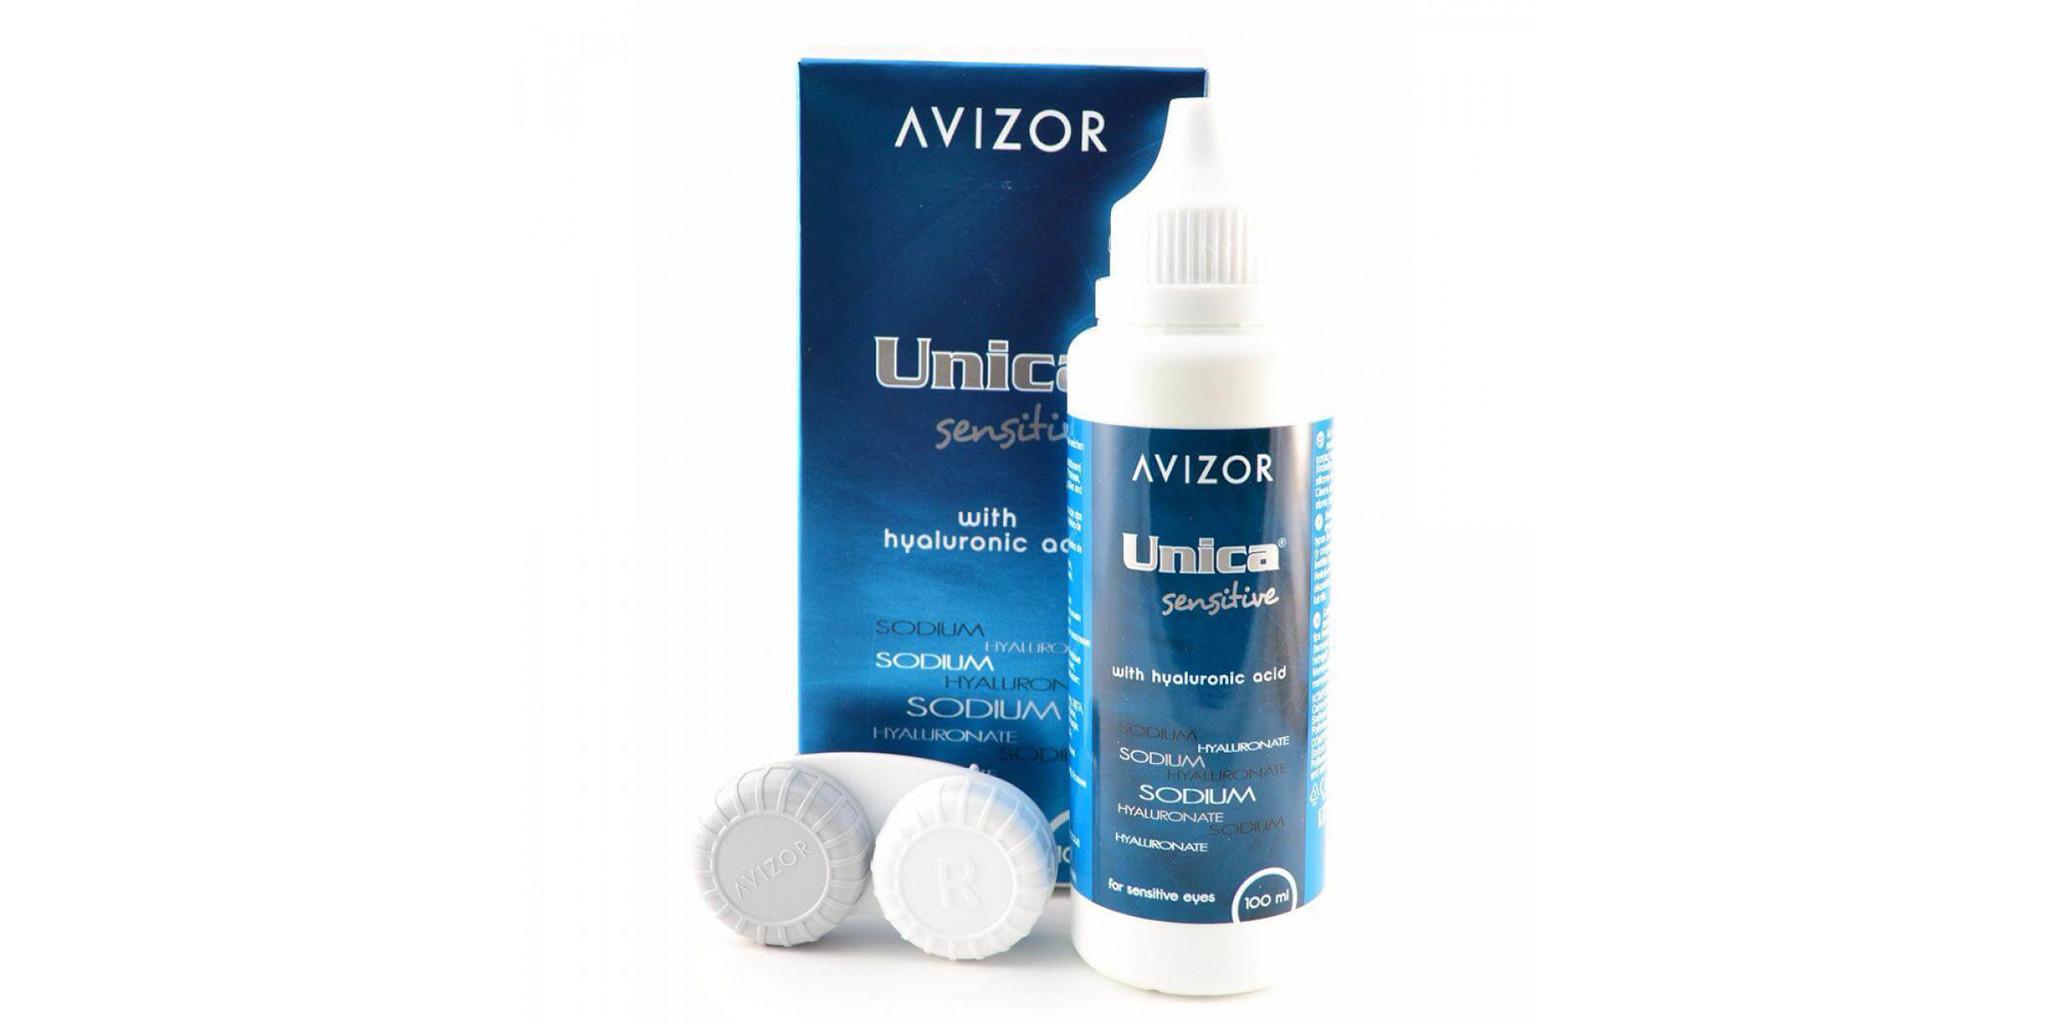 Unica Sensitive Avizor